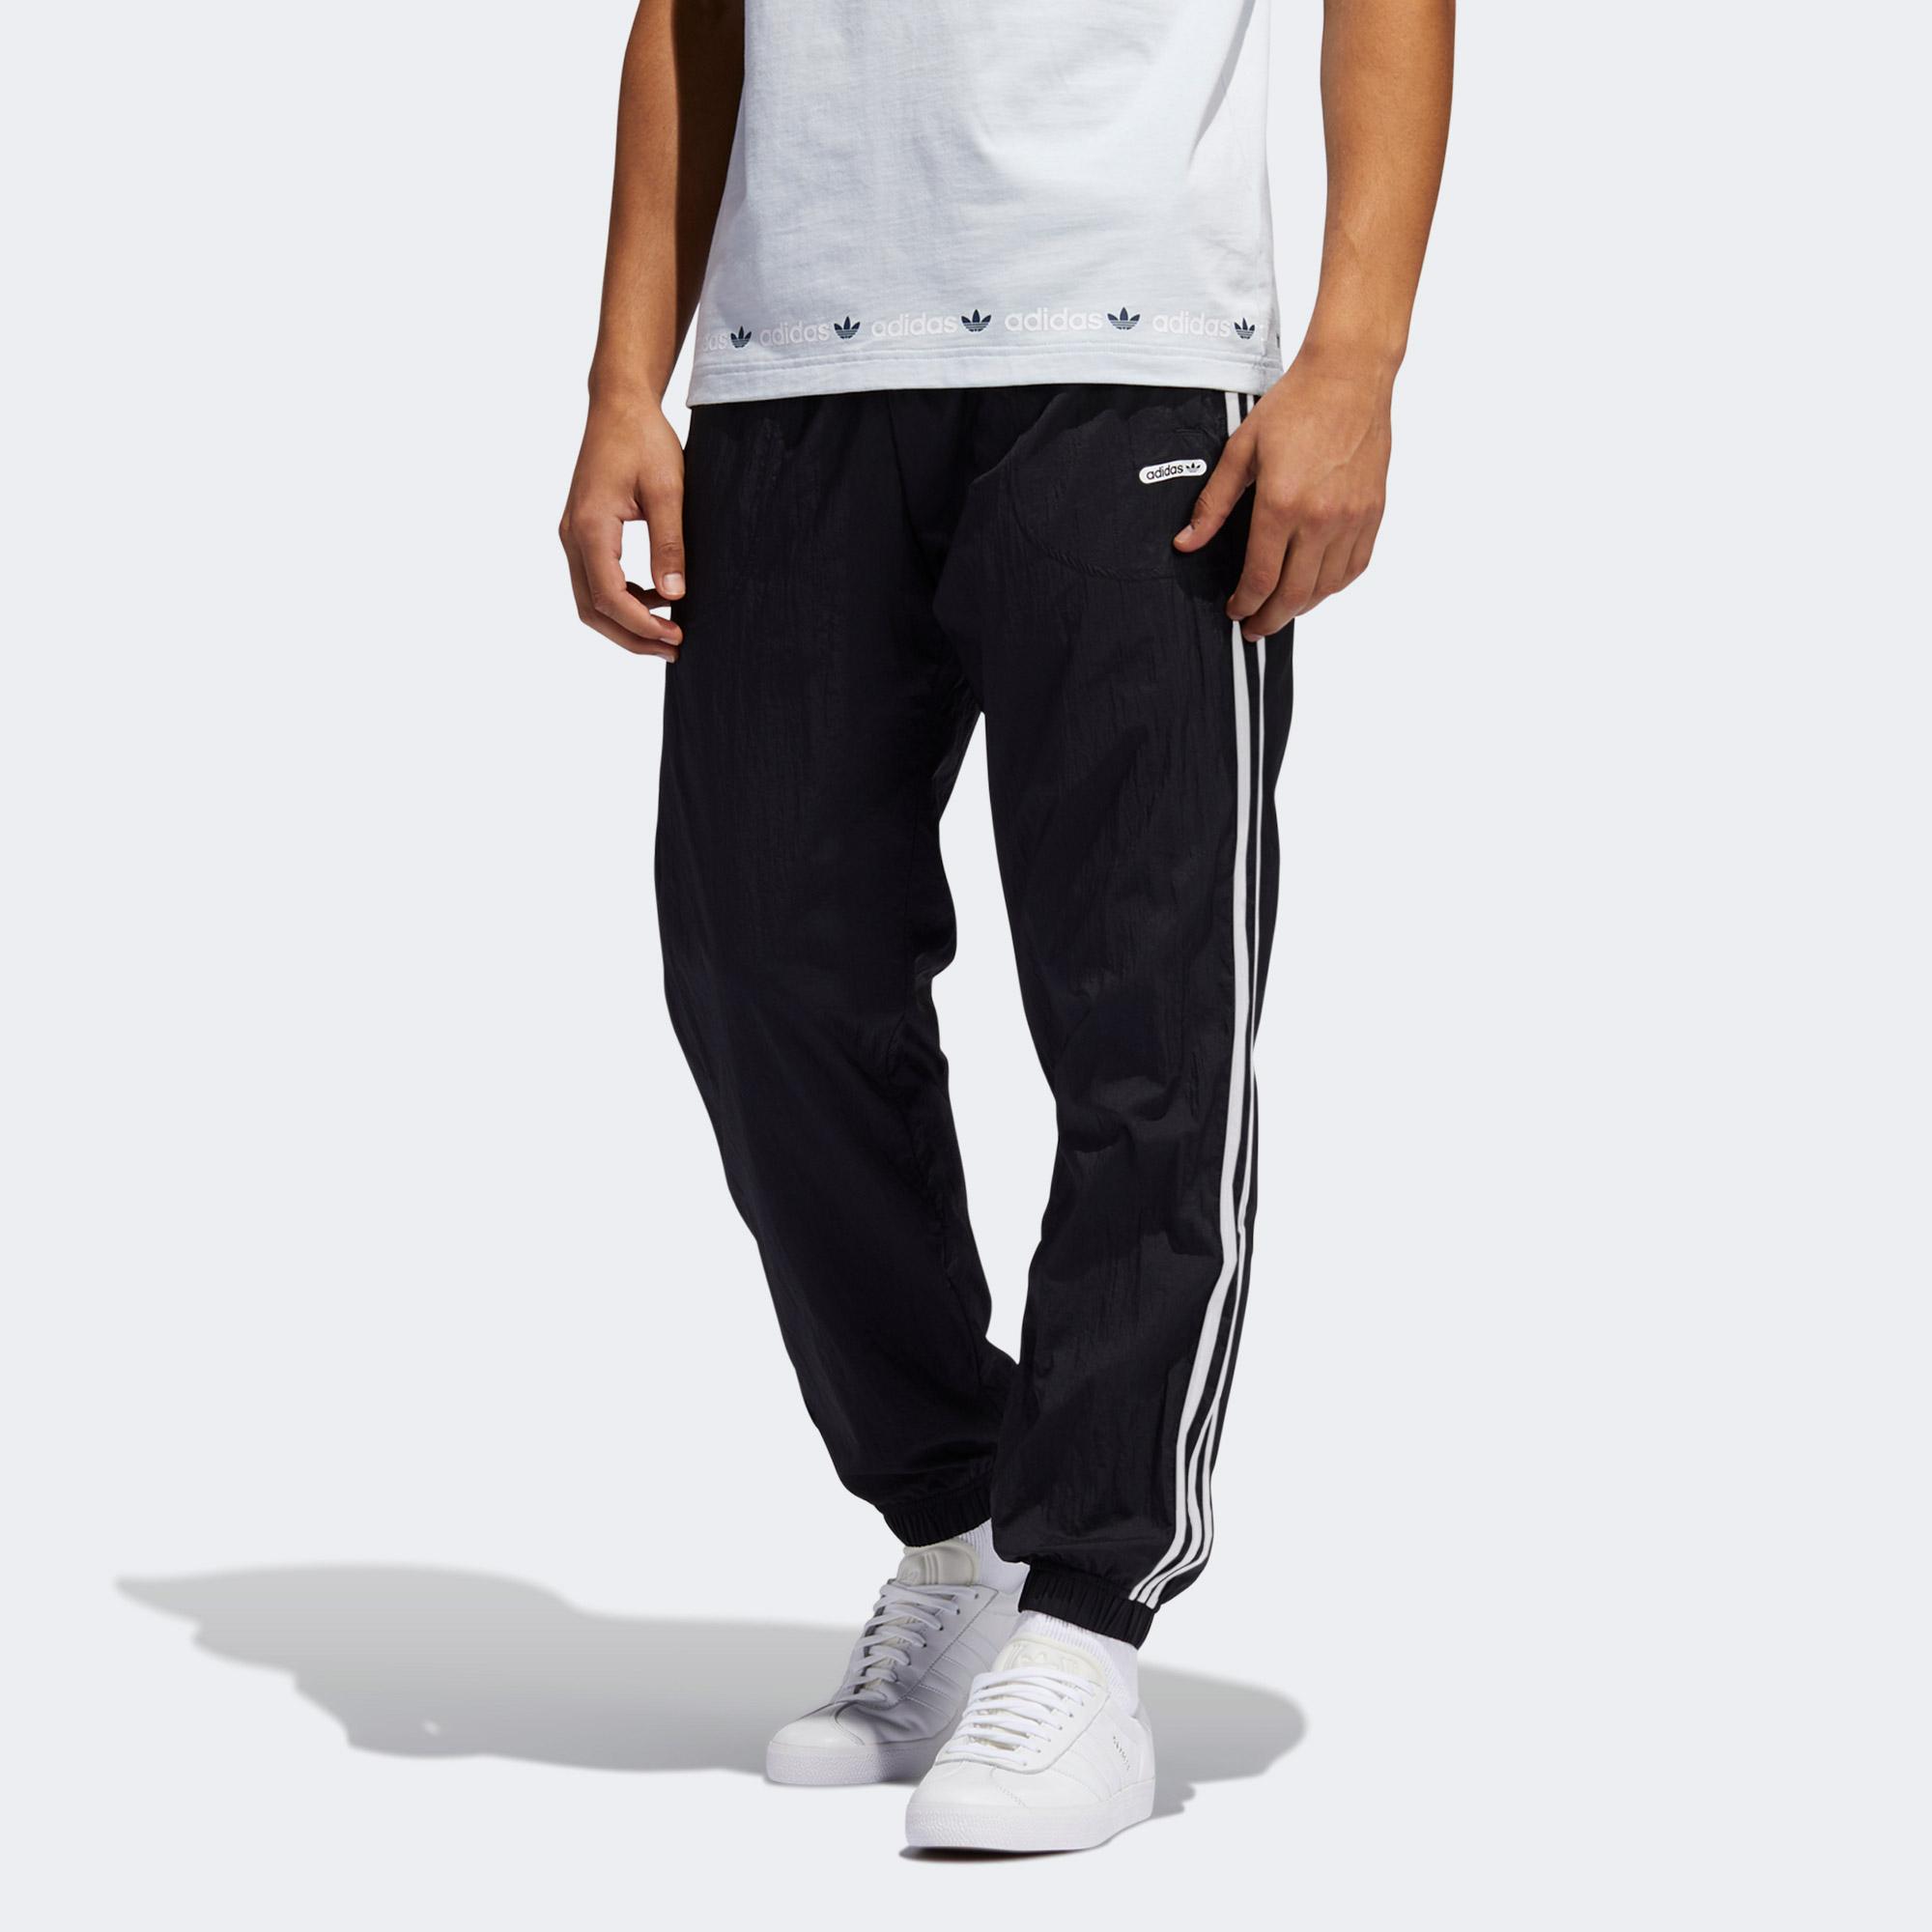 adidas Reverse Erkek Siyah Eşofman Altı